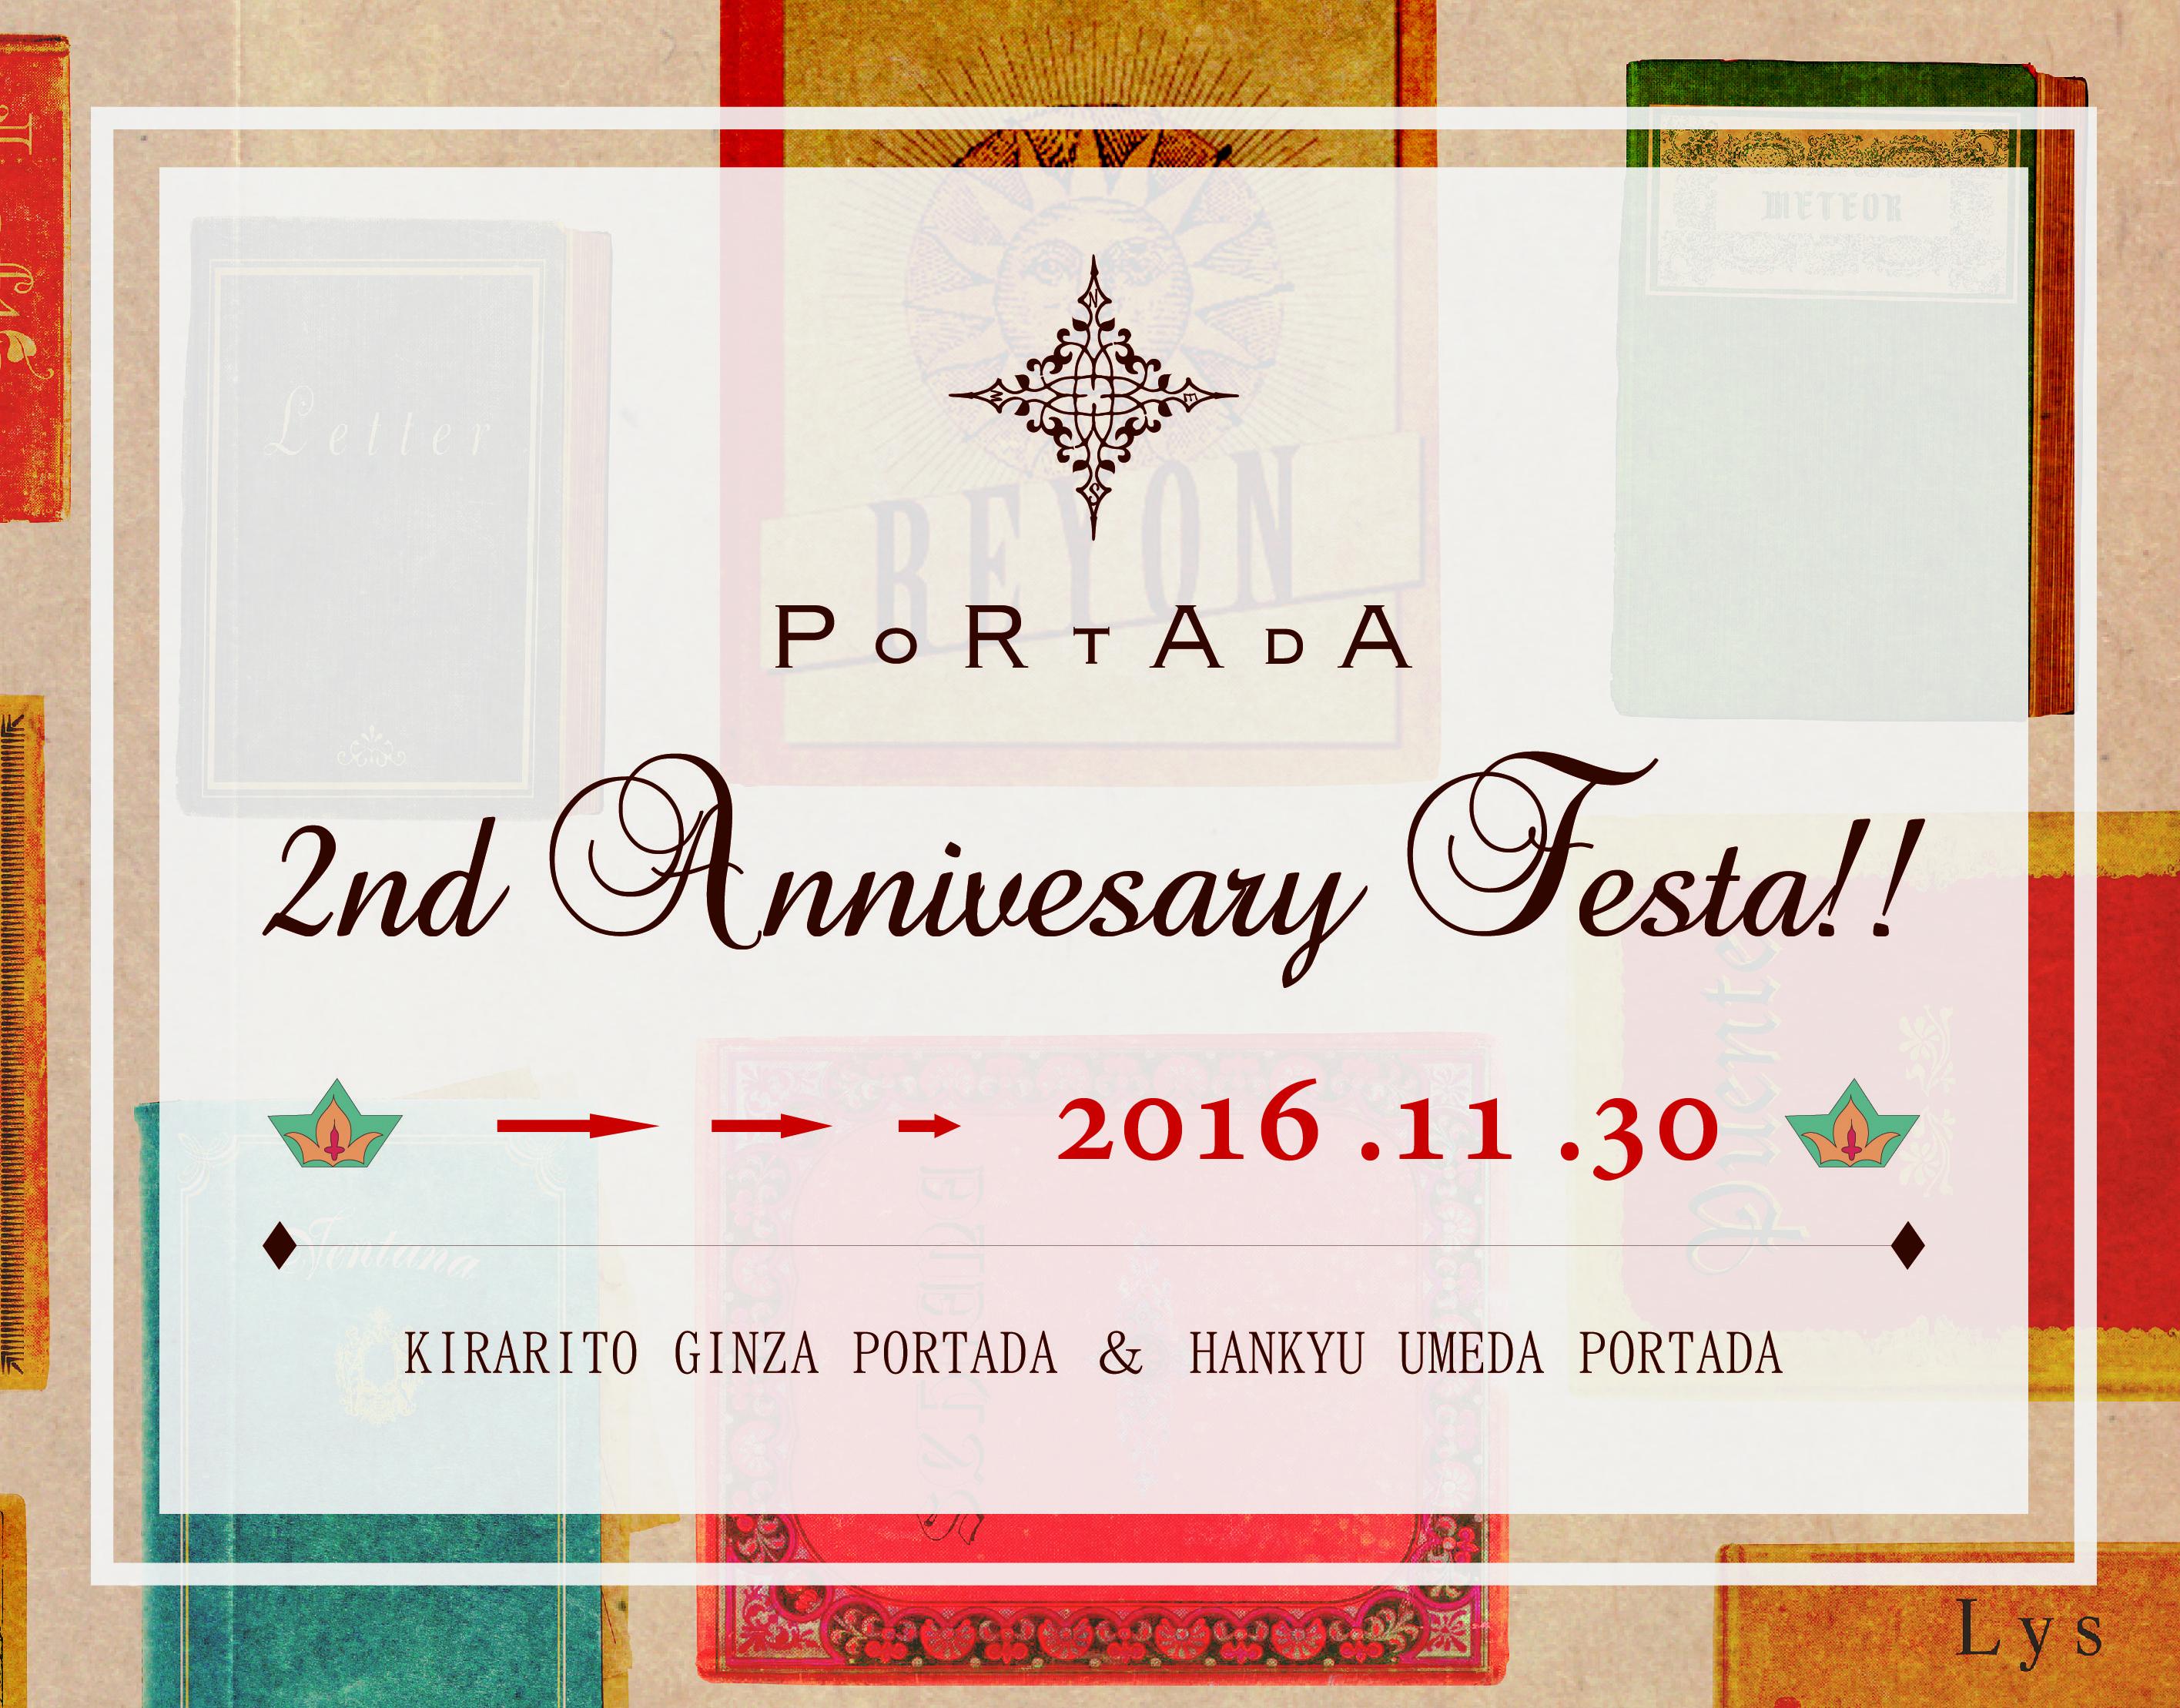 2nd Anniversary Festa!!!